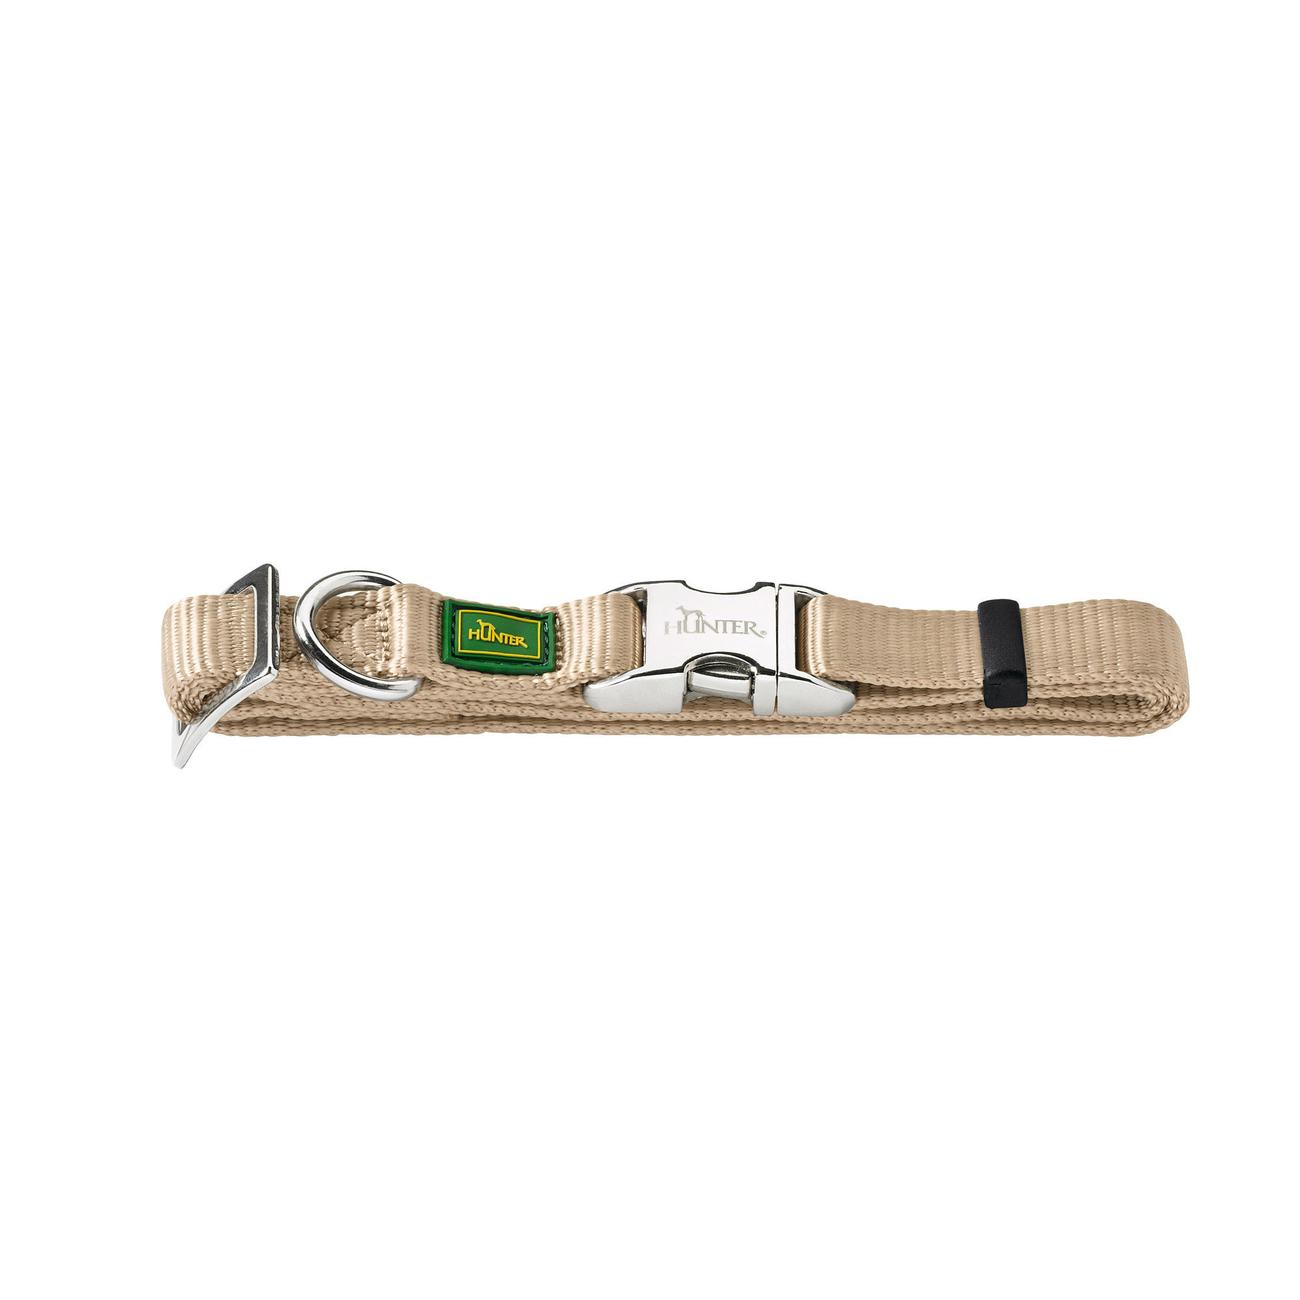 Hunter Halsband Vario Basic Alu Strong Verschluss 46668, Bild 6